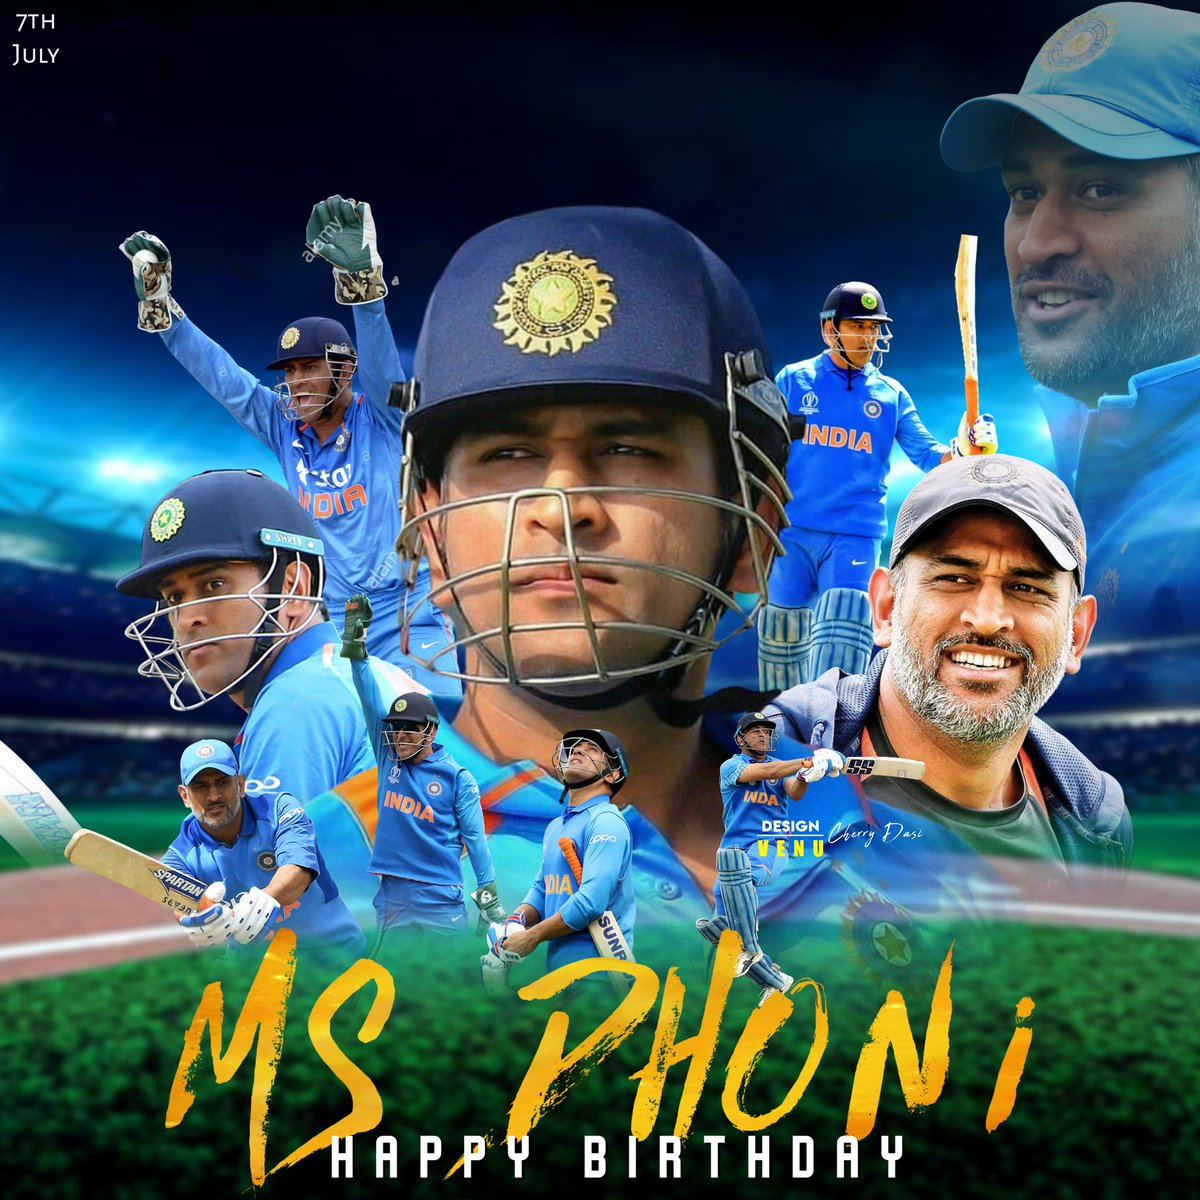 Here is My Design Wish you Very Happy Birthday @msdhoni Captain 🤩❤️! @VijayDFans @SomaSar37104149 #HappyBirthdayDhoni #VenuCherryDasiEdits @soumyaaa_vd_fan @TrendsDhoni @TheDhoniEra  @DHONIism  @DhoniFansEdits  @msdfansofficial @ https://t.co/ayFSdEBKWD